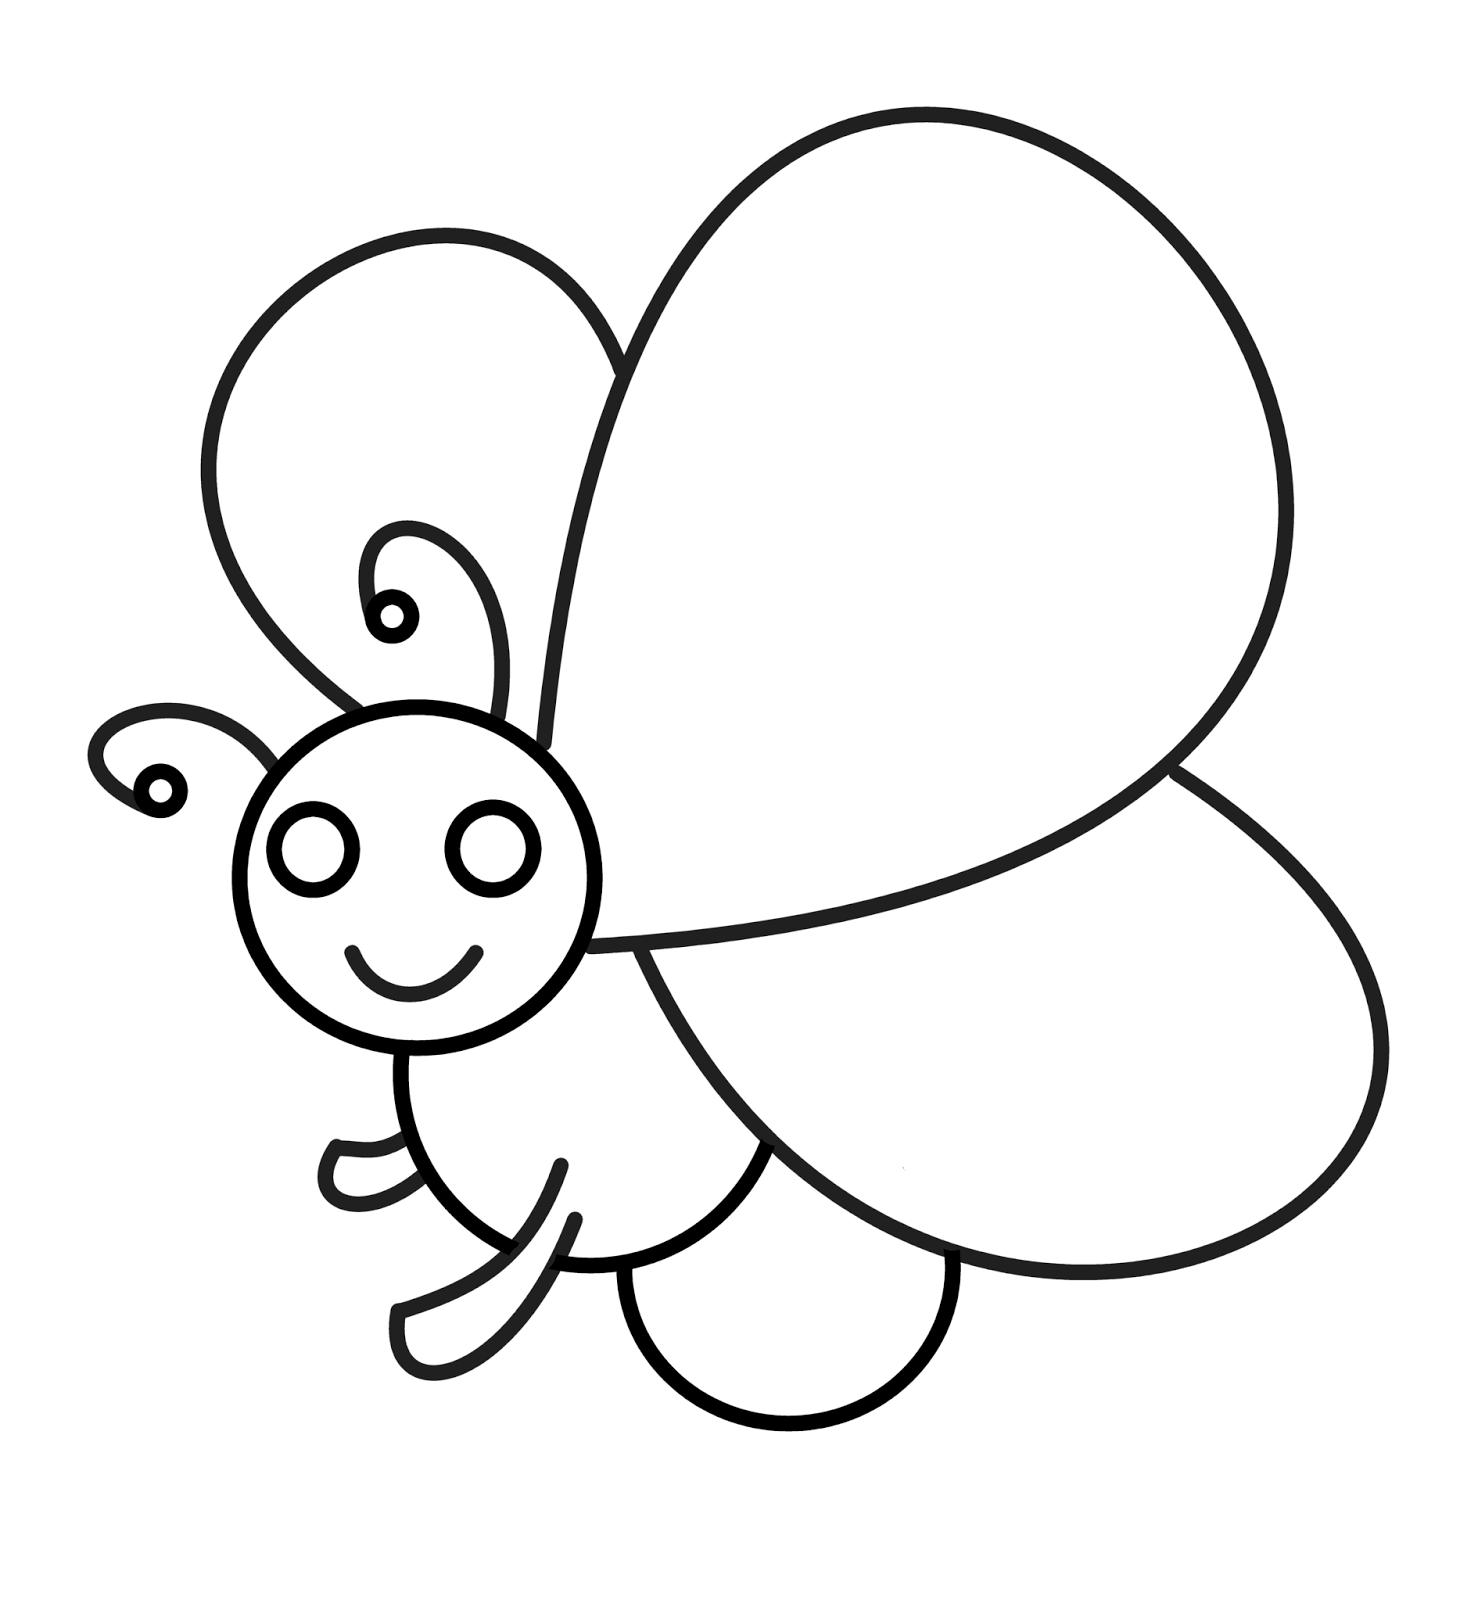 how to draw cartoons september 2013 cartoon drawing pinterest